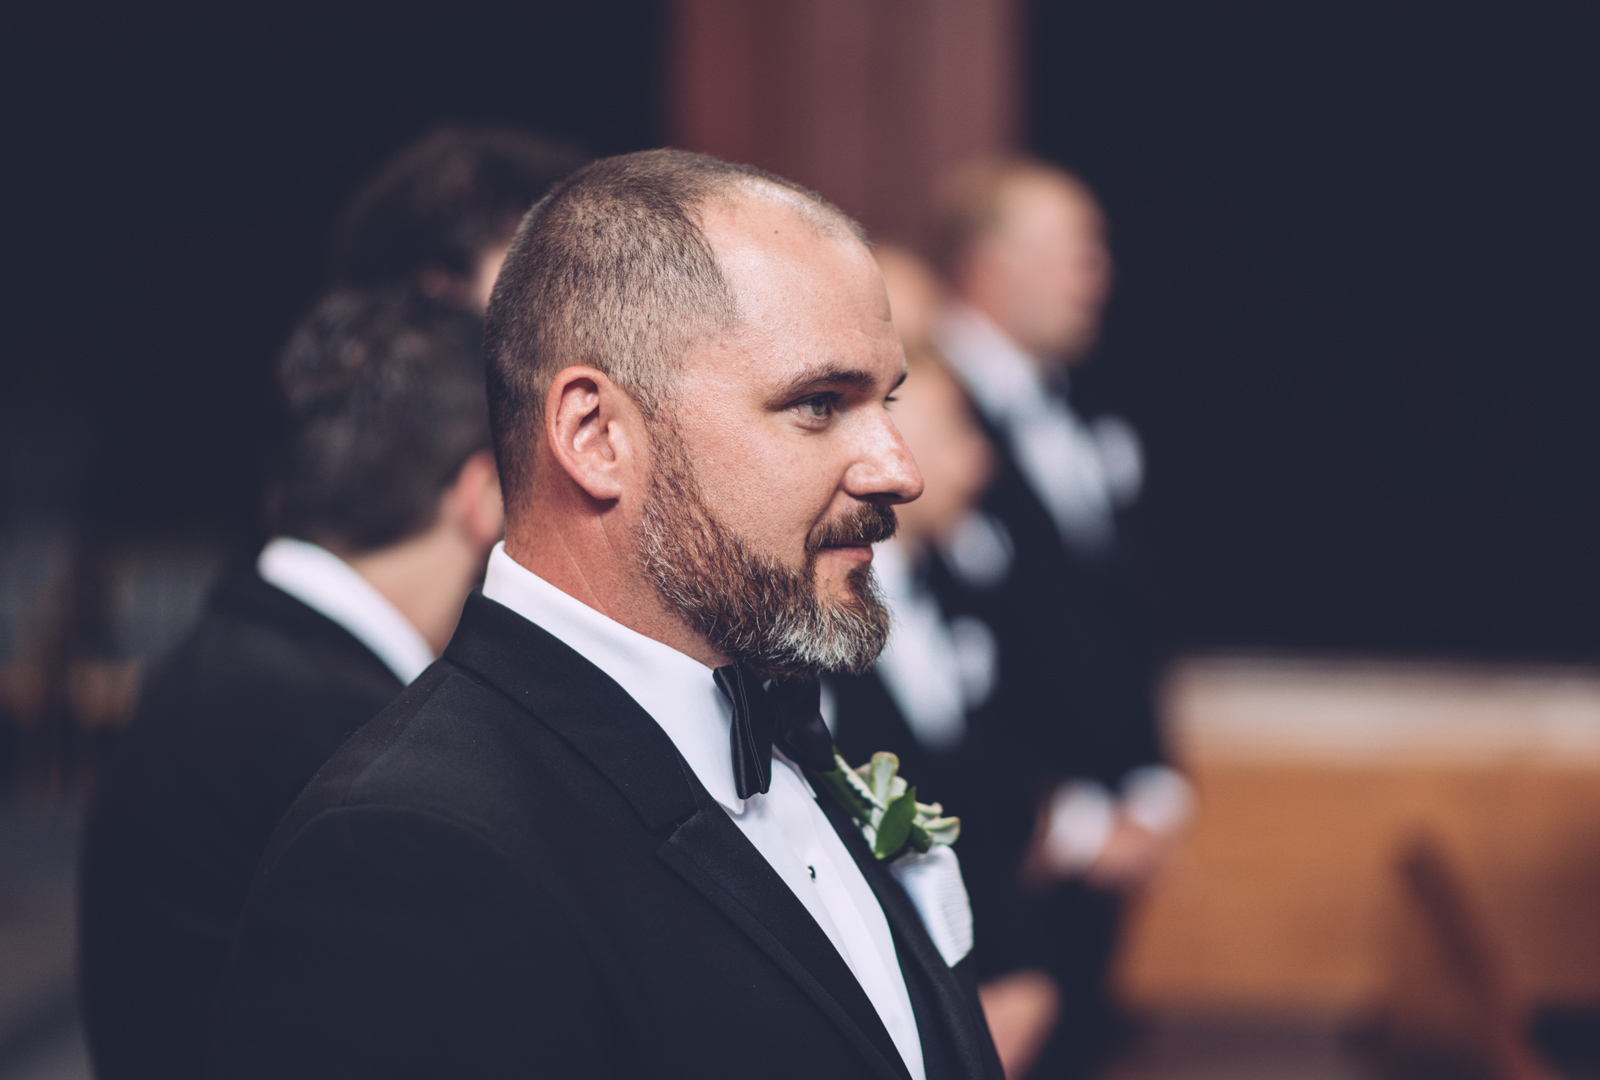 jessica_jonathon_wedding_blog25.jpg